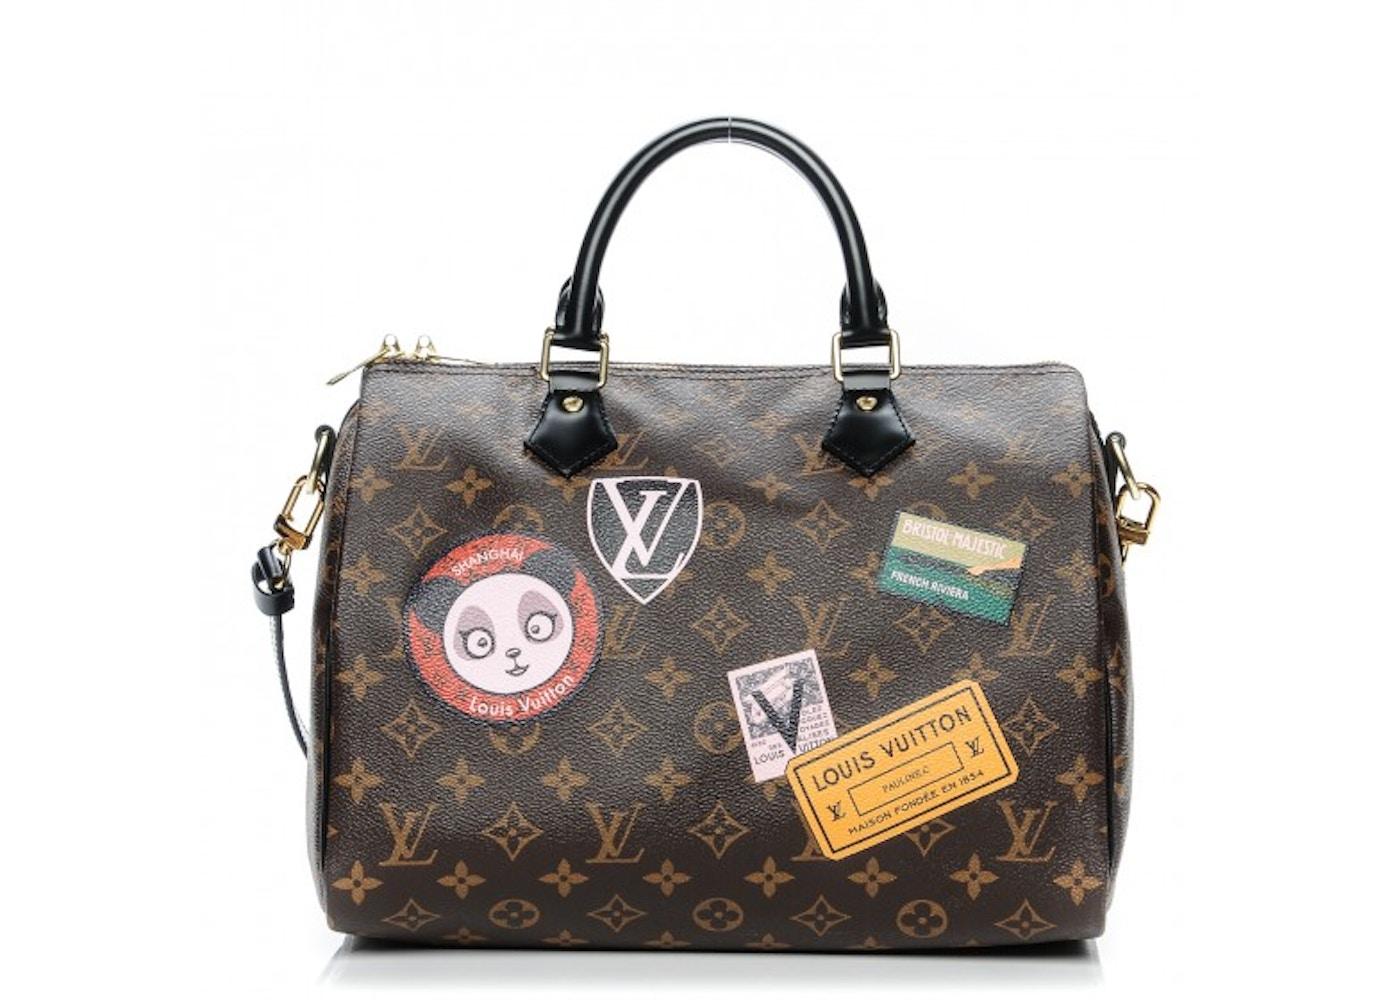 Louis Vuitton Speedy Bandouliere Monogram World Tour Without Accessories 30 Brown Multicolor